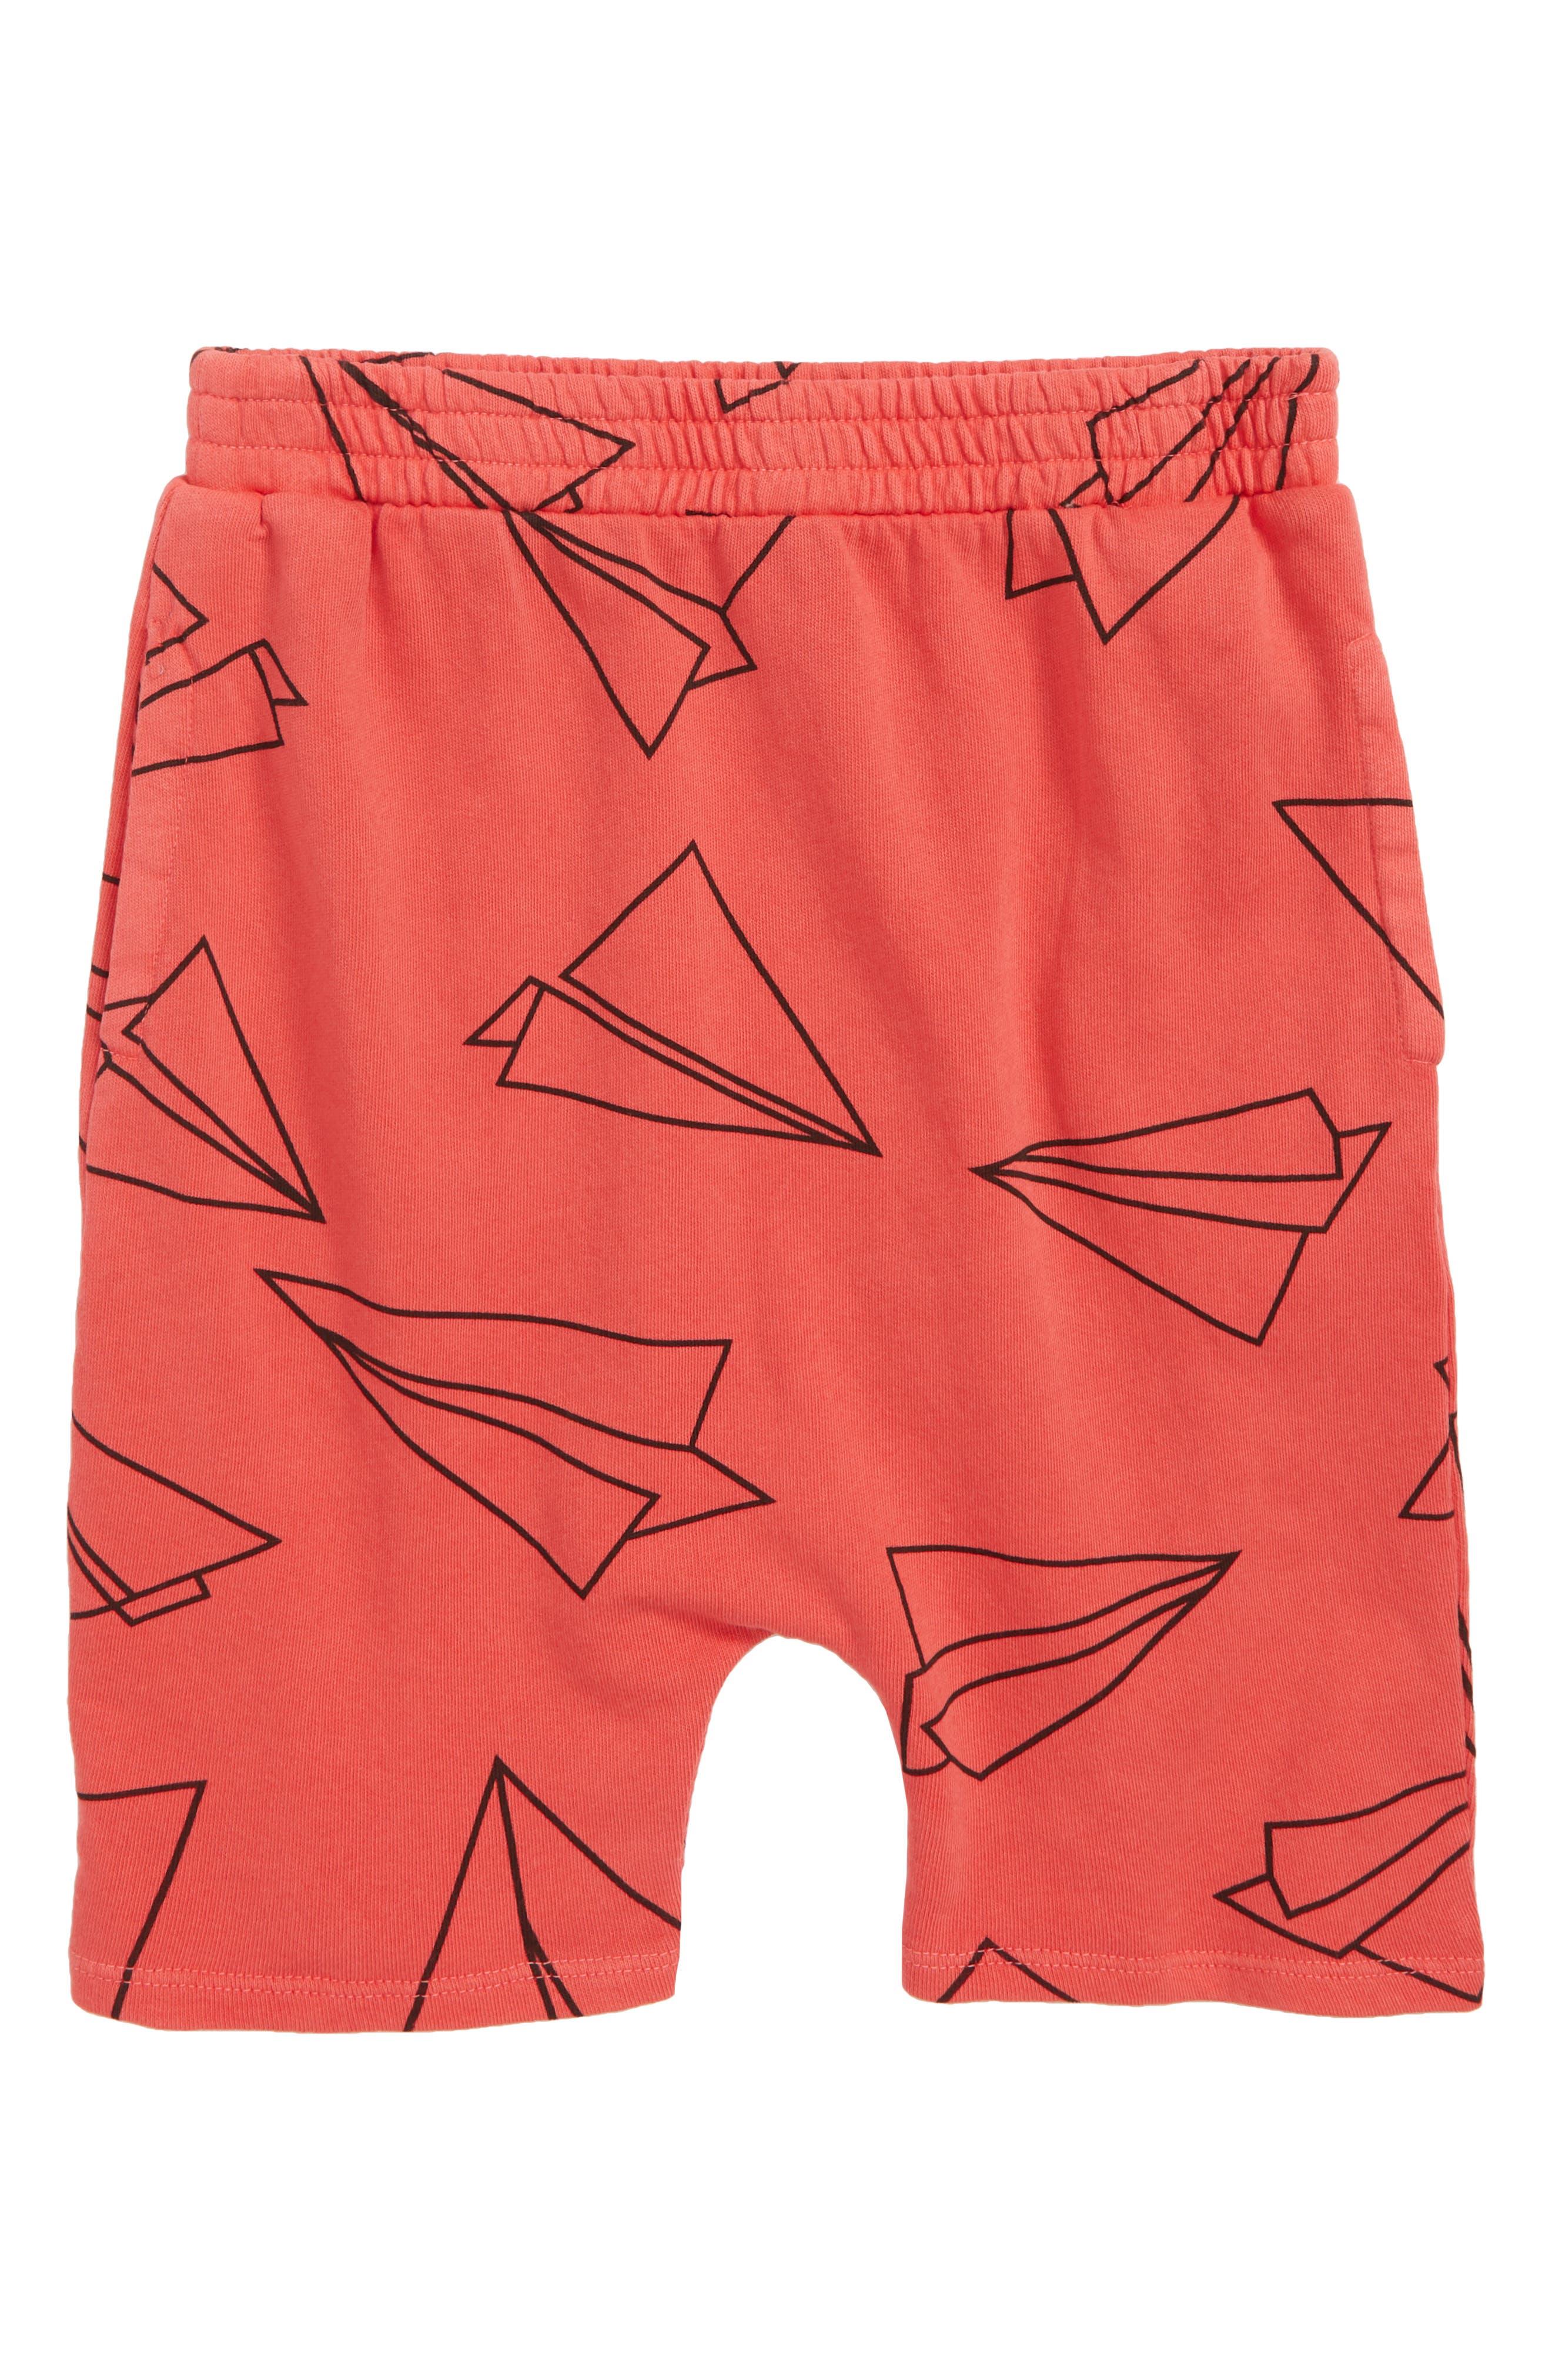 Alternate Image 1 Selected - Stem Print Shorts (Toddler Boys, Little Boys & Big Boys)